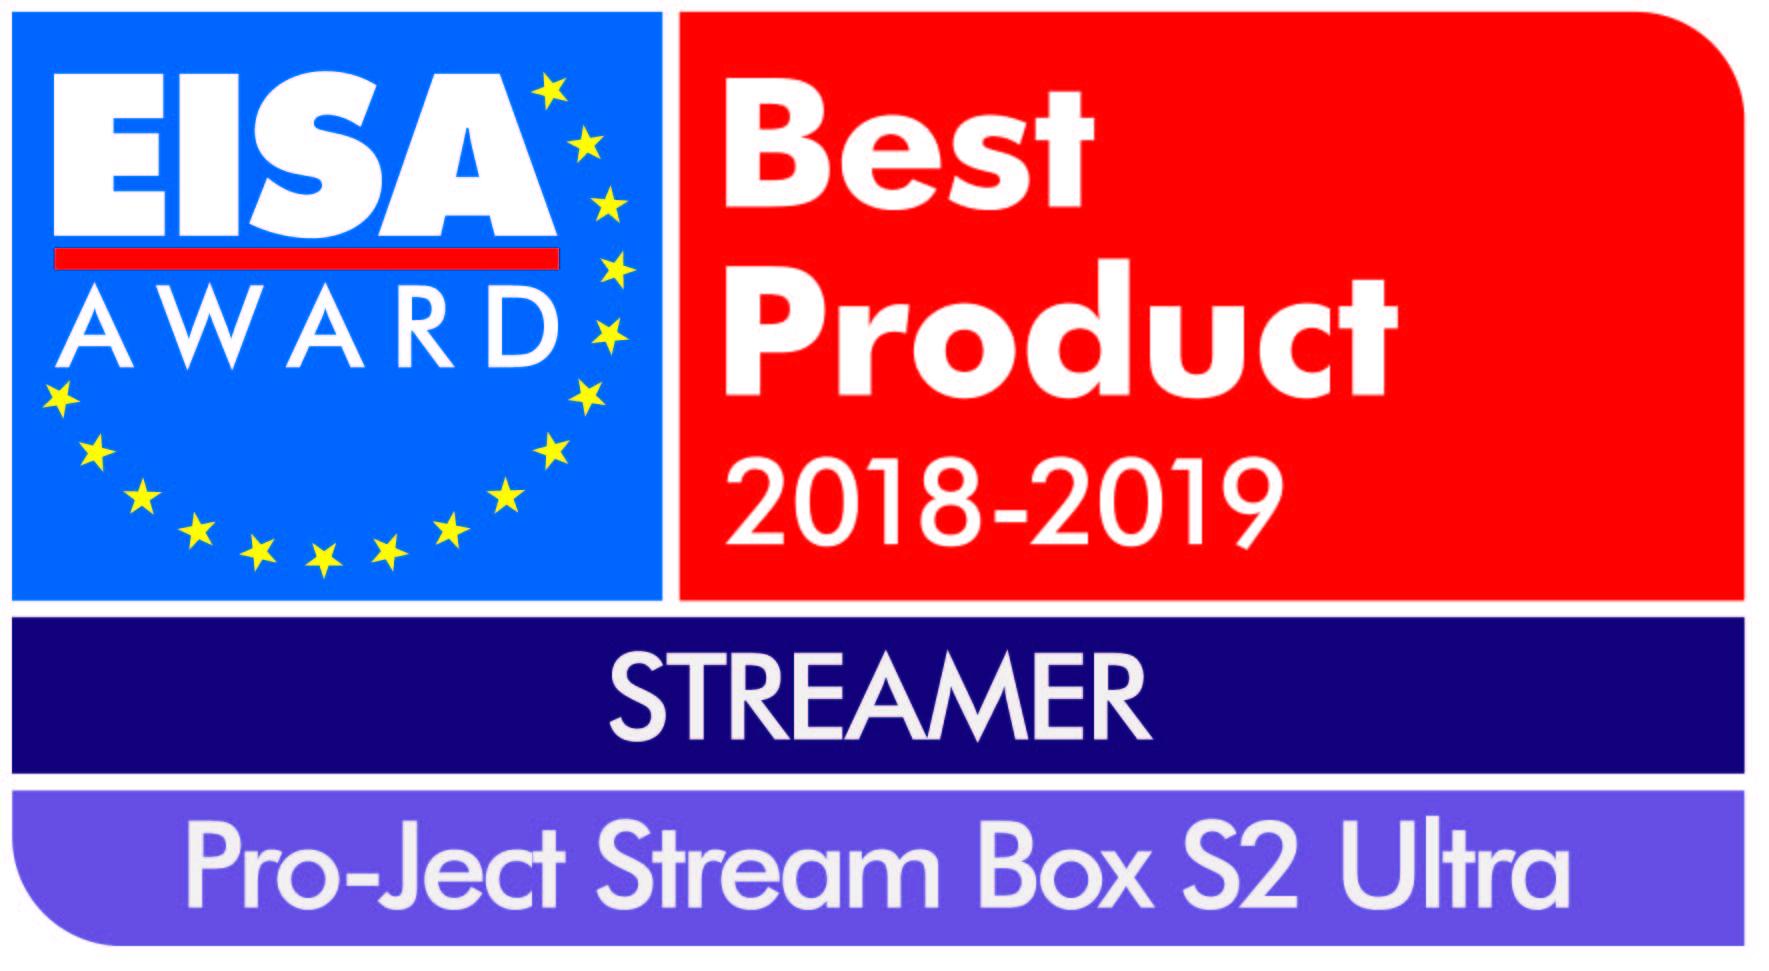 Pro-Ject Stream Box S2 Ultra EISA Award